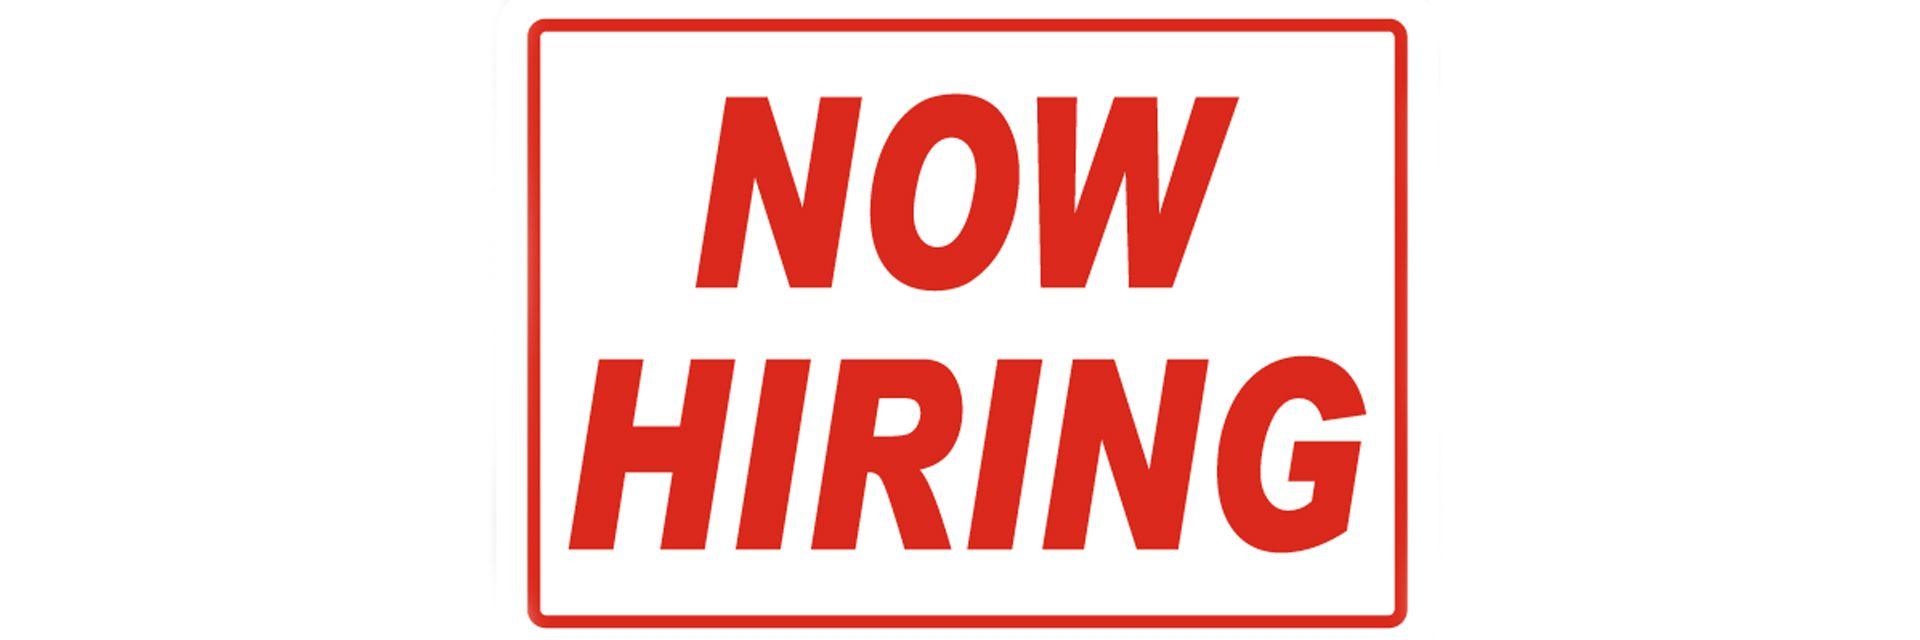 Danbury Powersports is now hiring!